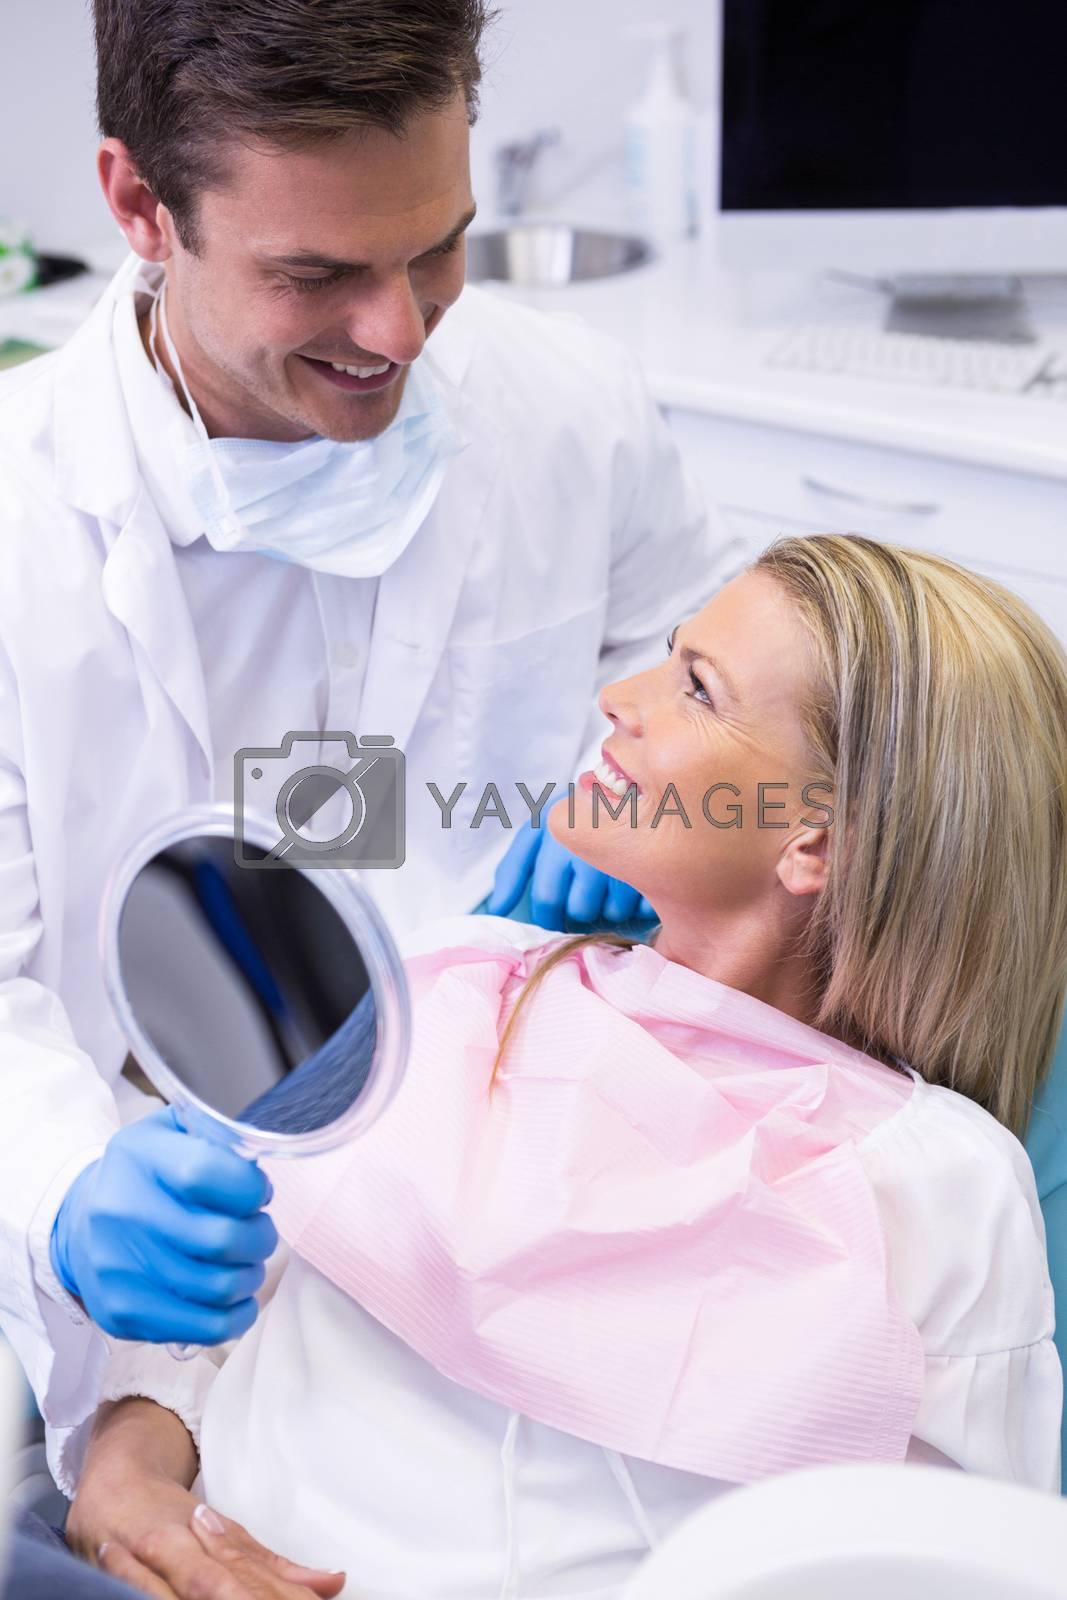 Dentist showing mirror to happy patient by Wavebreakmedia